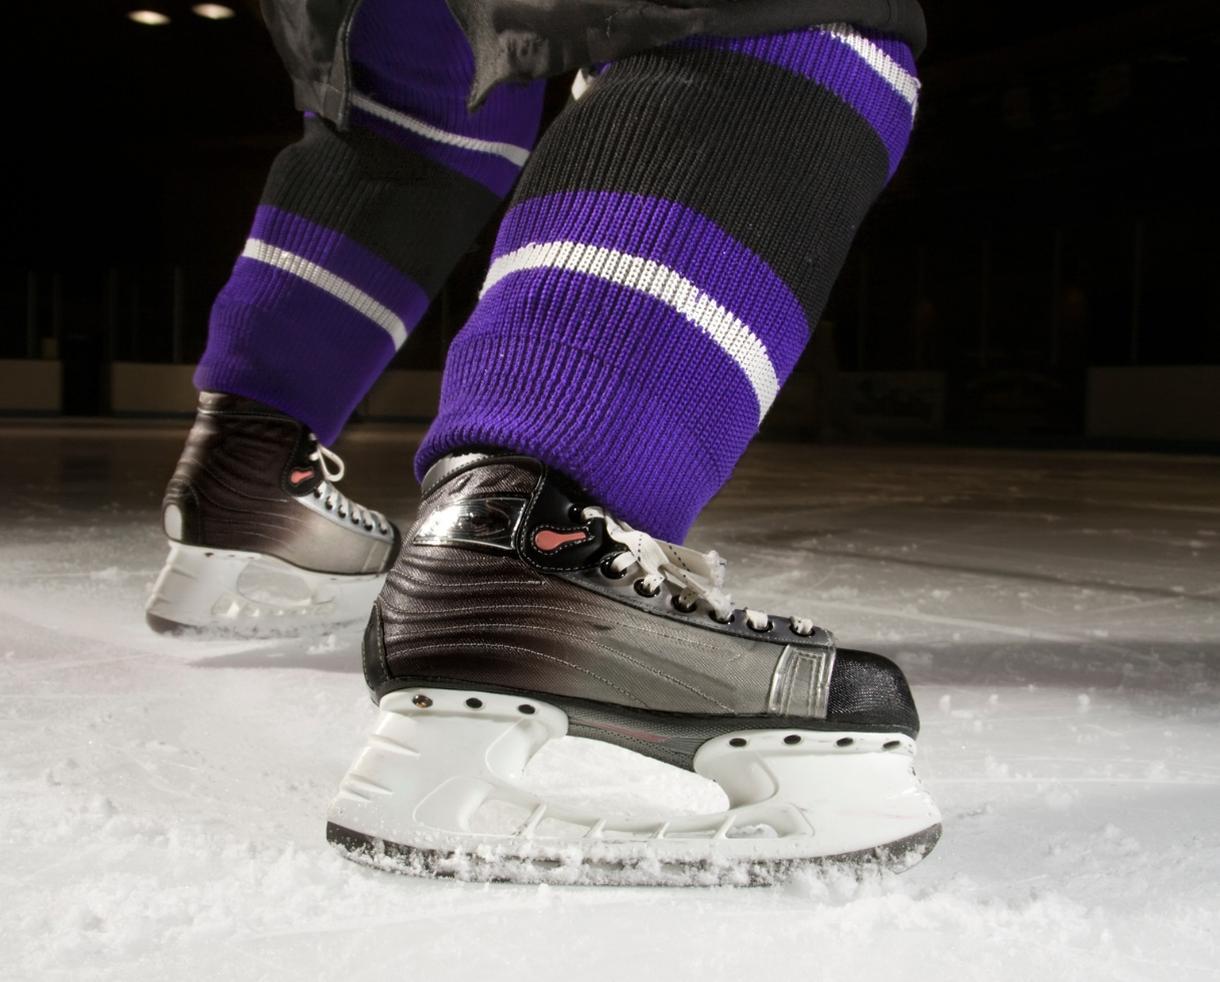 Two Admissions + Skate Rental to Haymarket Iceplex